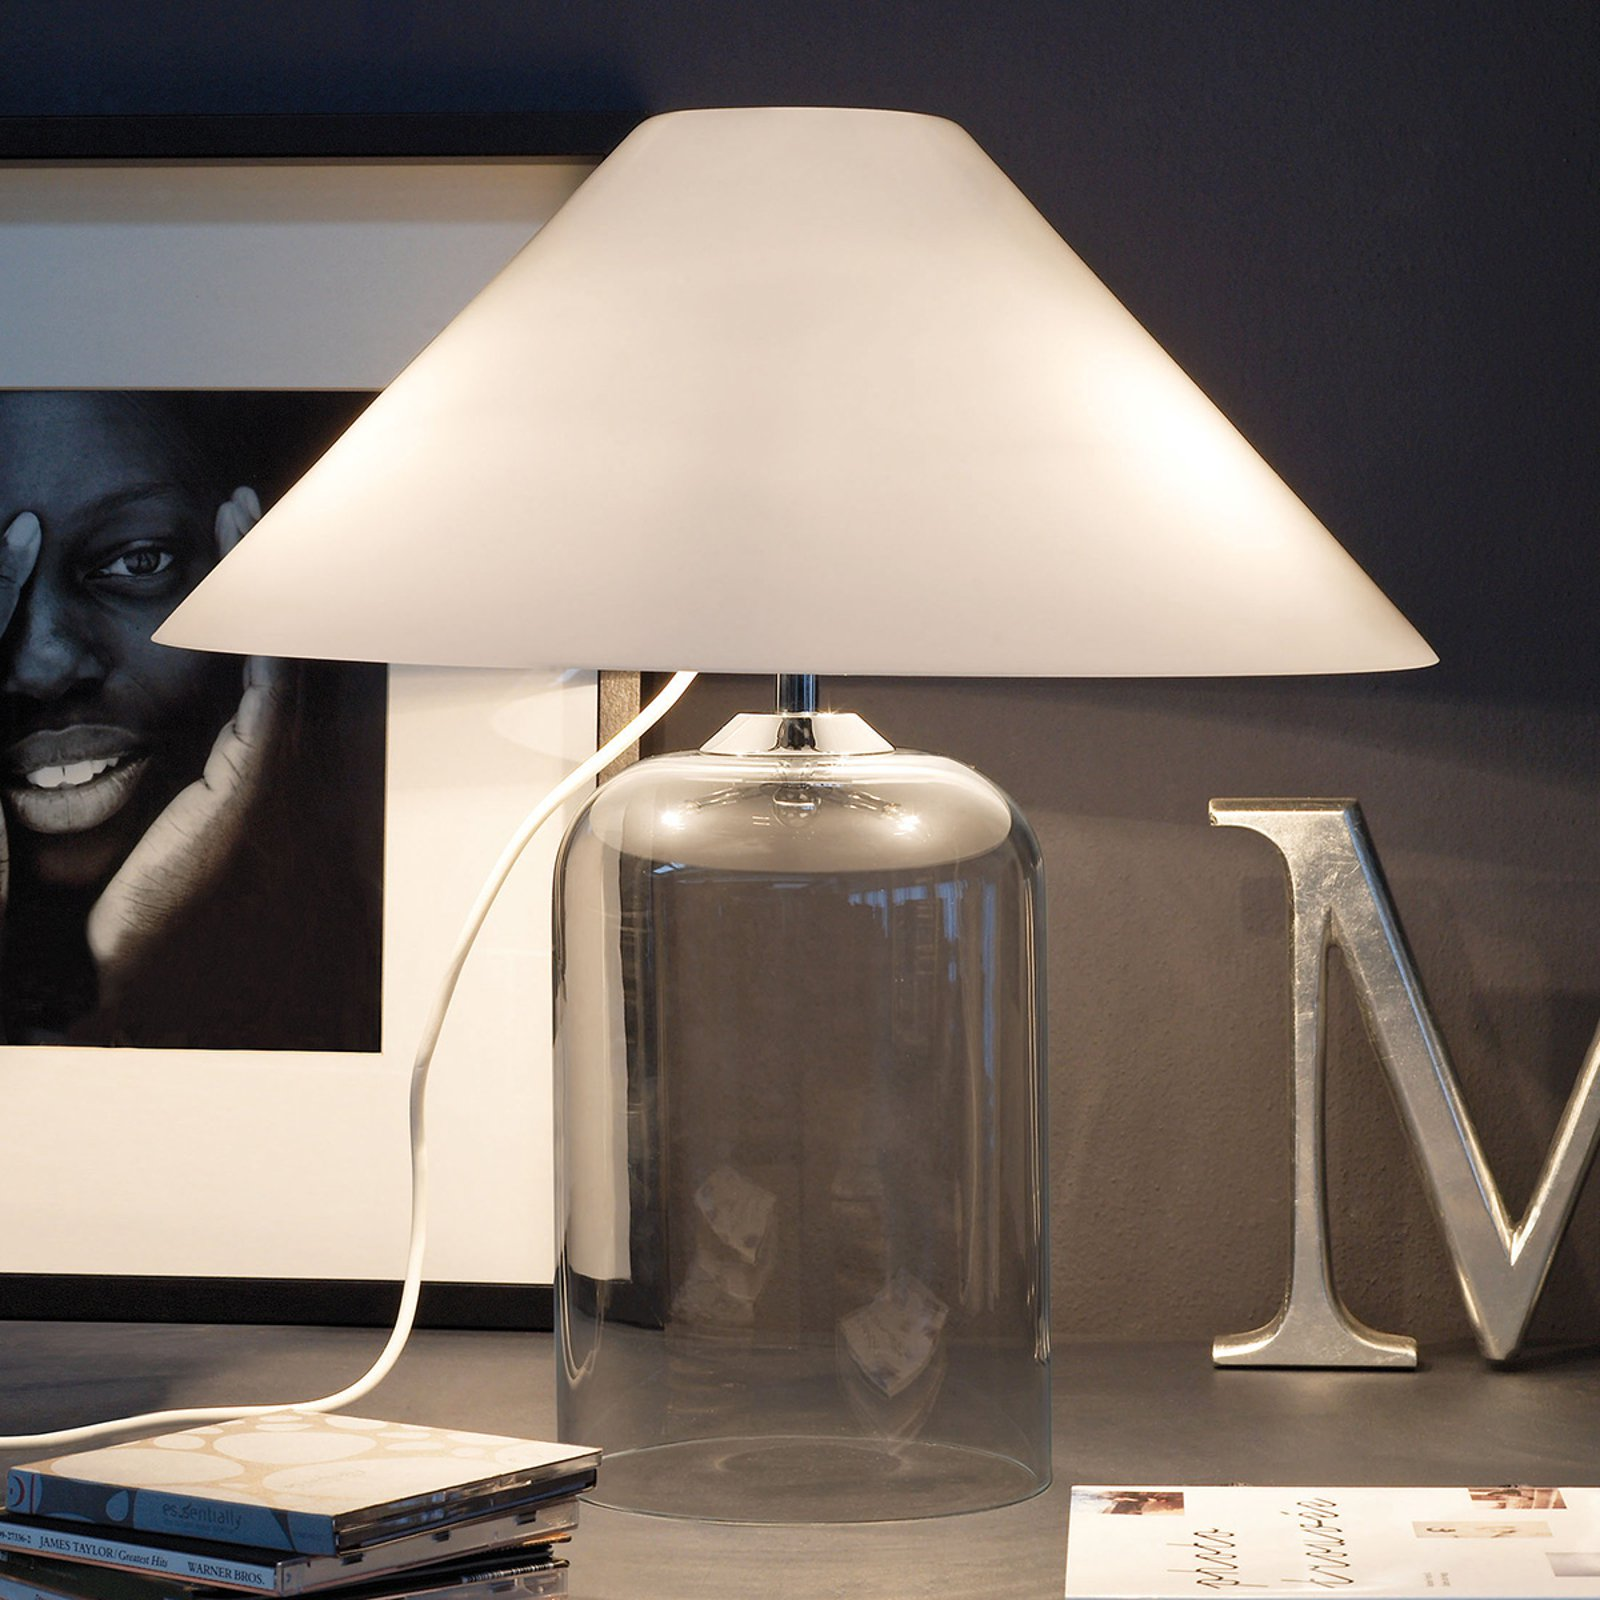 Tekstil-bordlampe Alega med klar glassfot